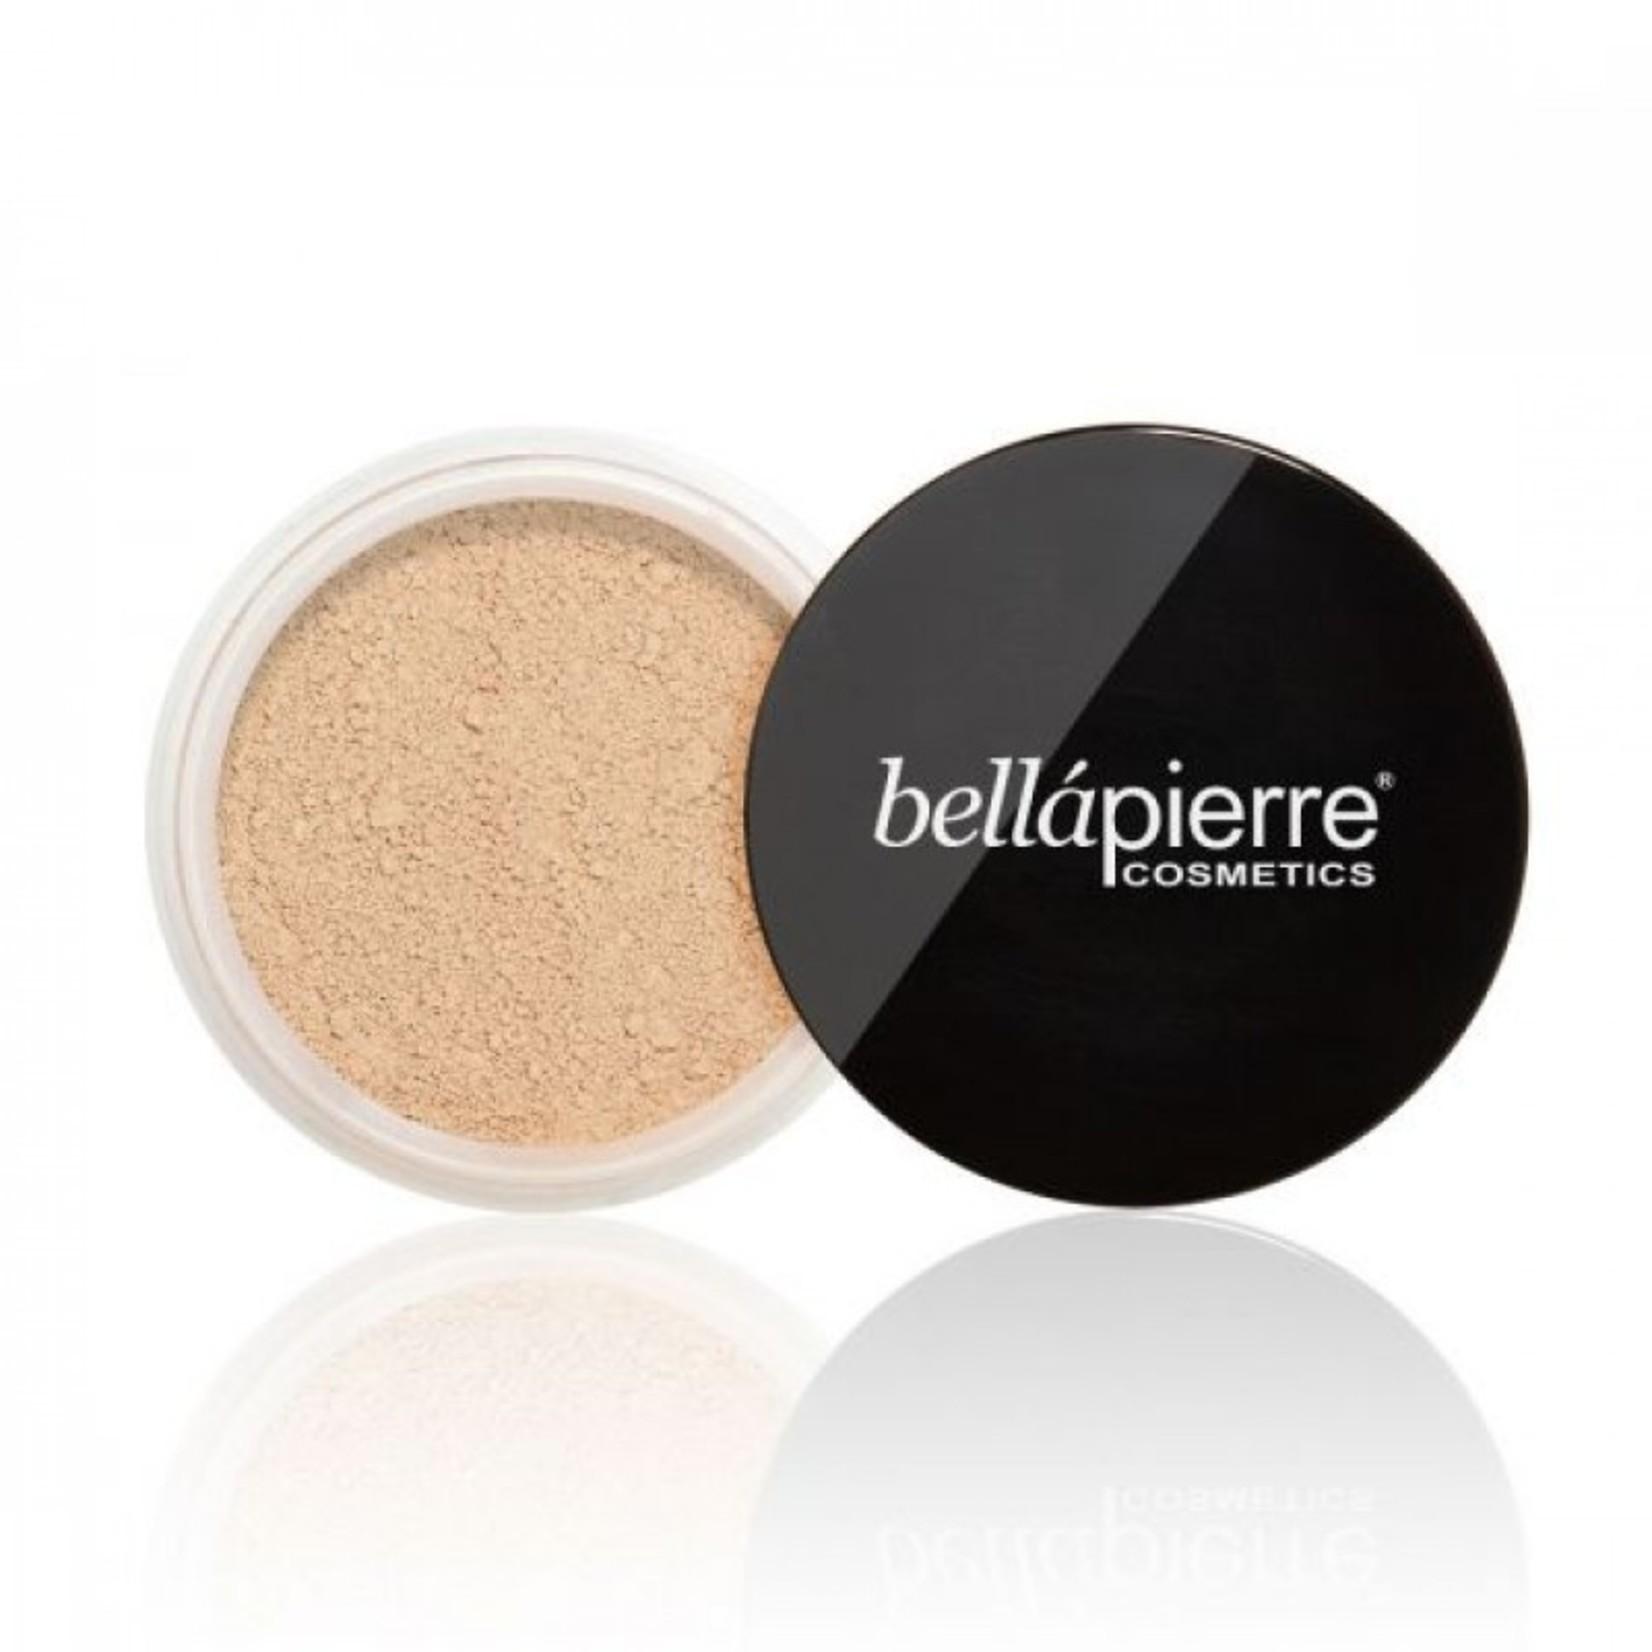 Bellapierre Mineral loose - foundation - Biscotti